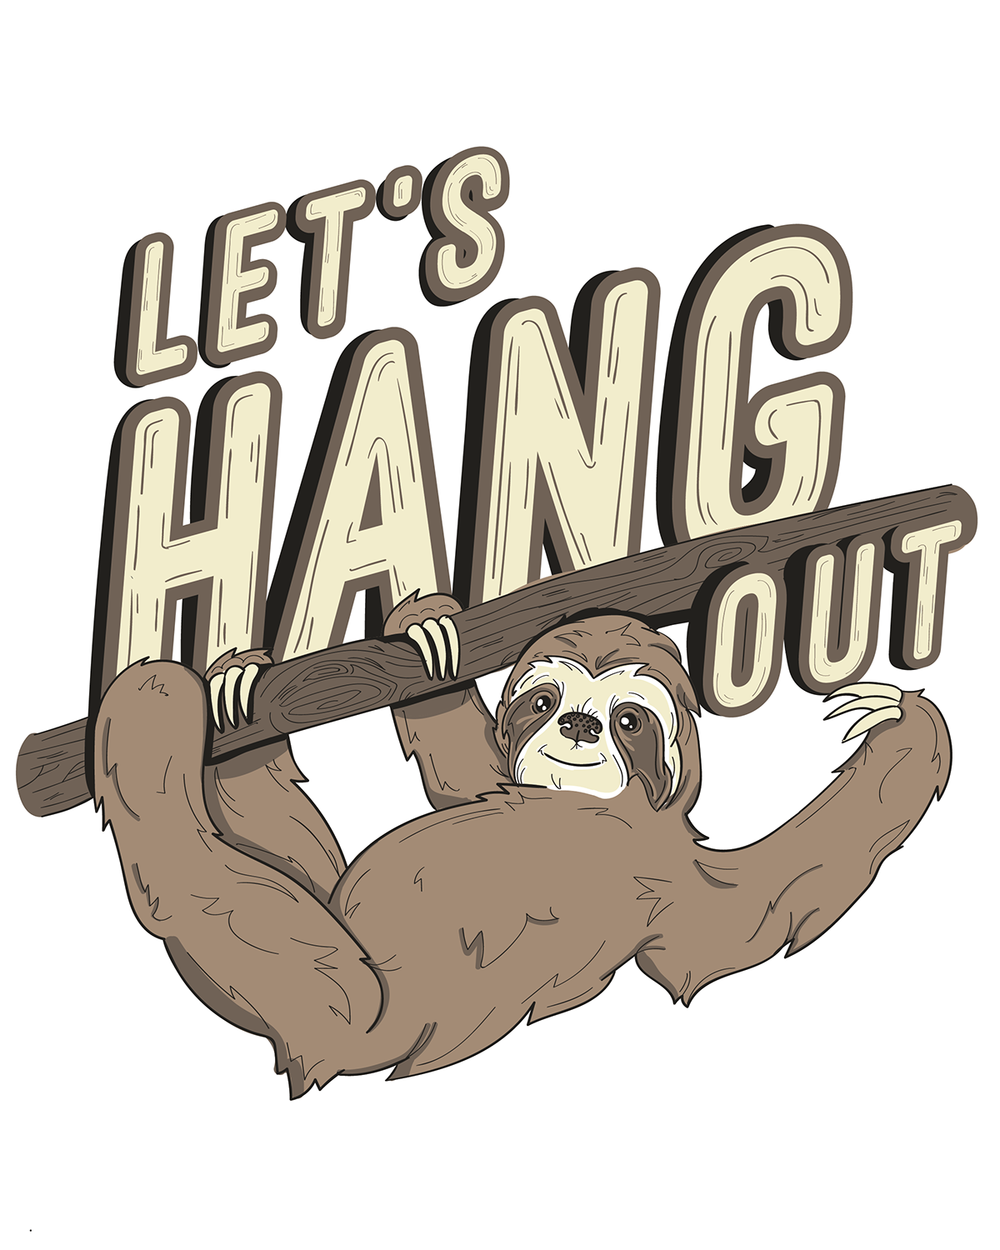 slothy.png